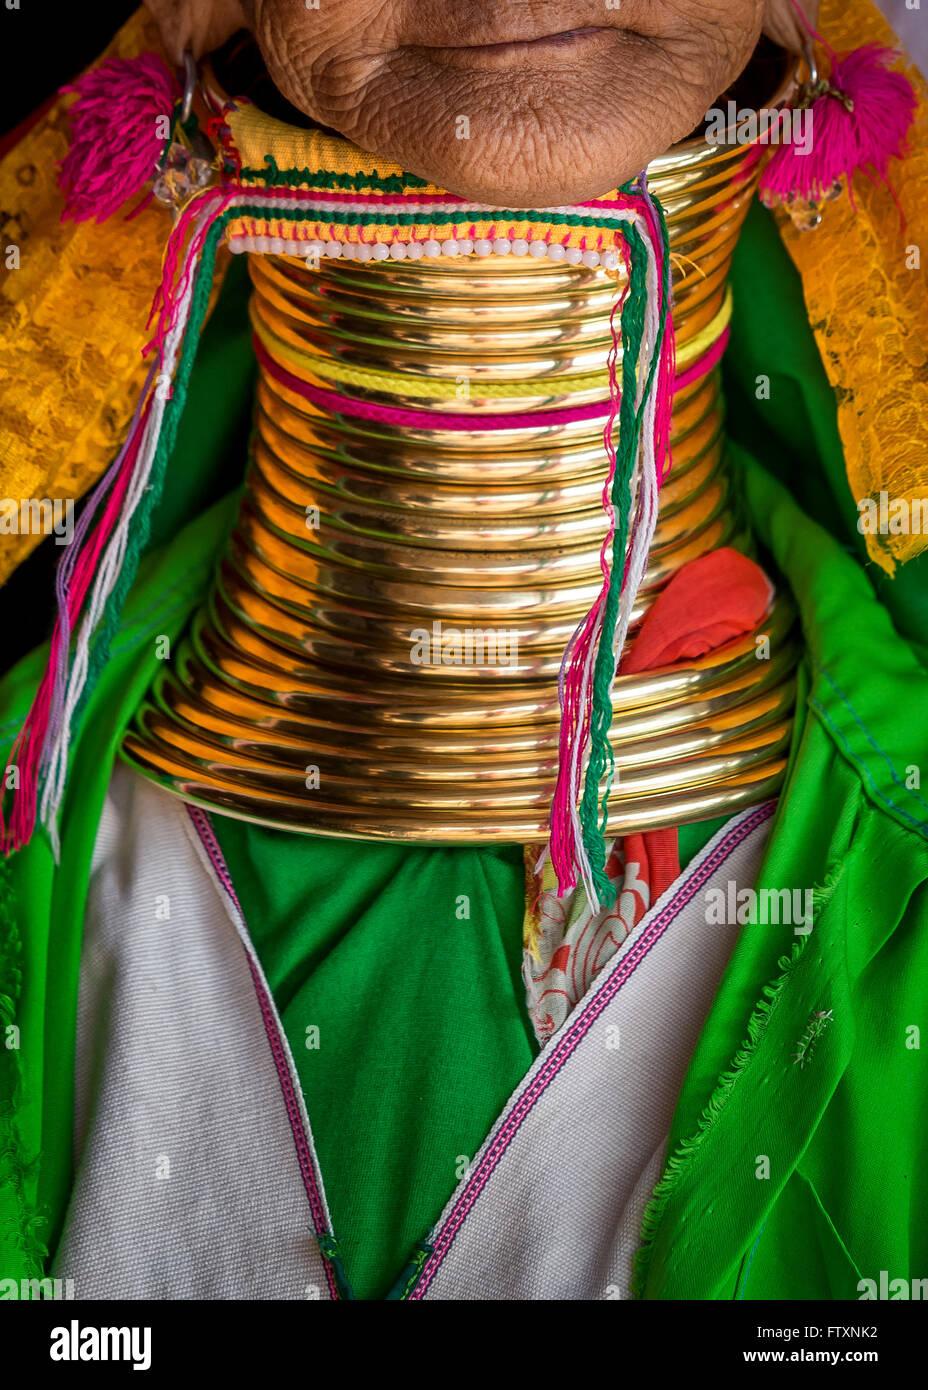 Padaung Tribe's Woman wearing golden rings around neck Stock Photo